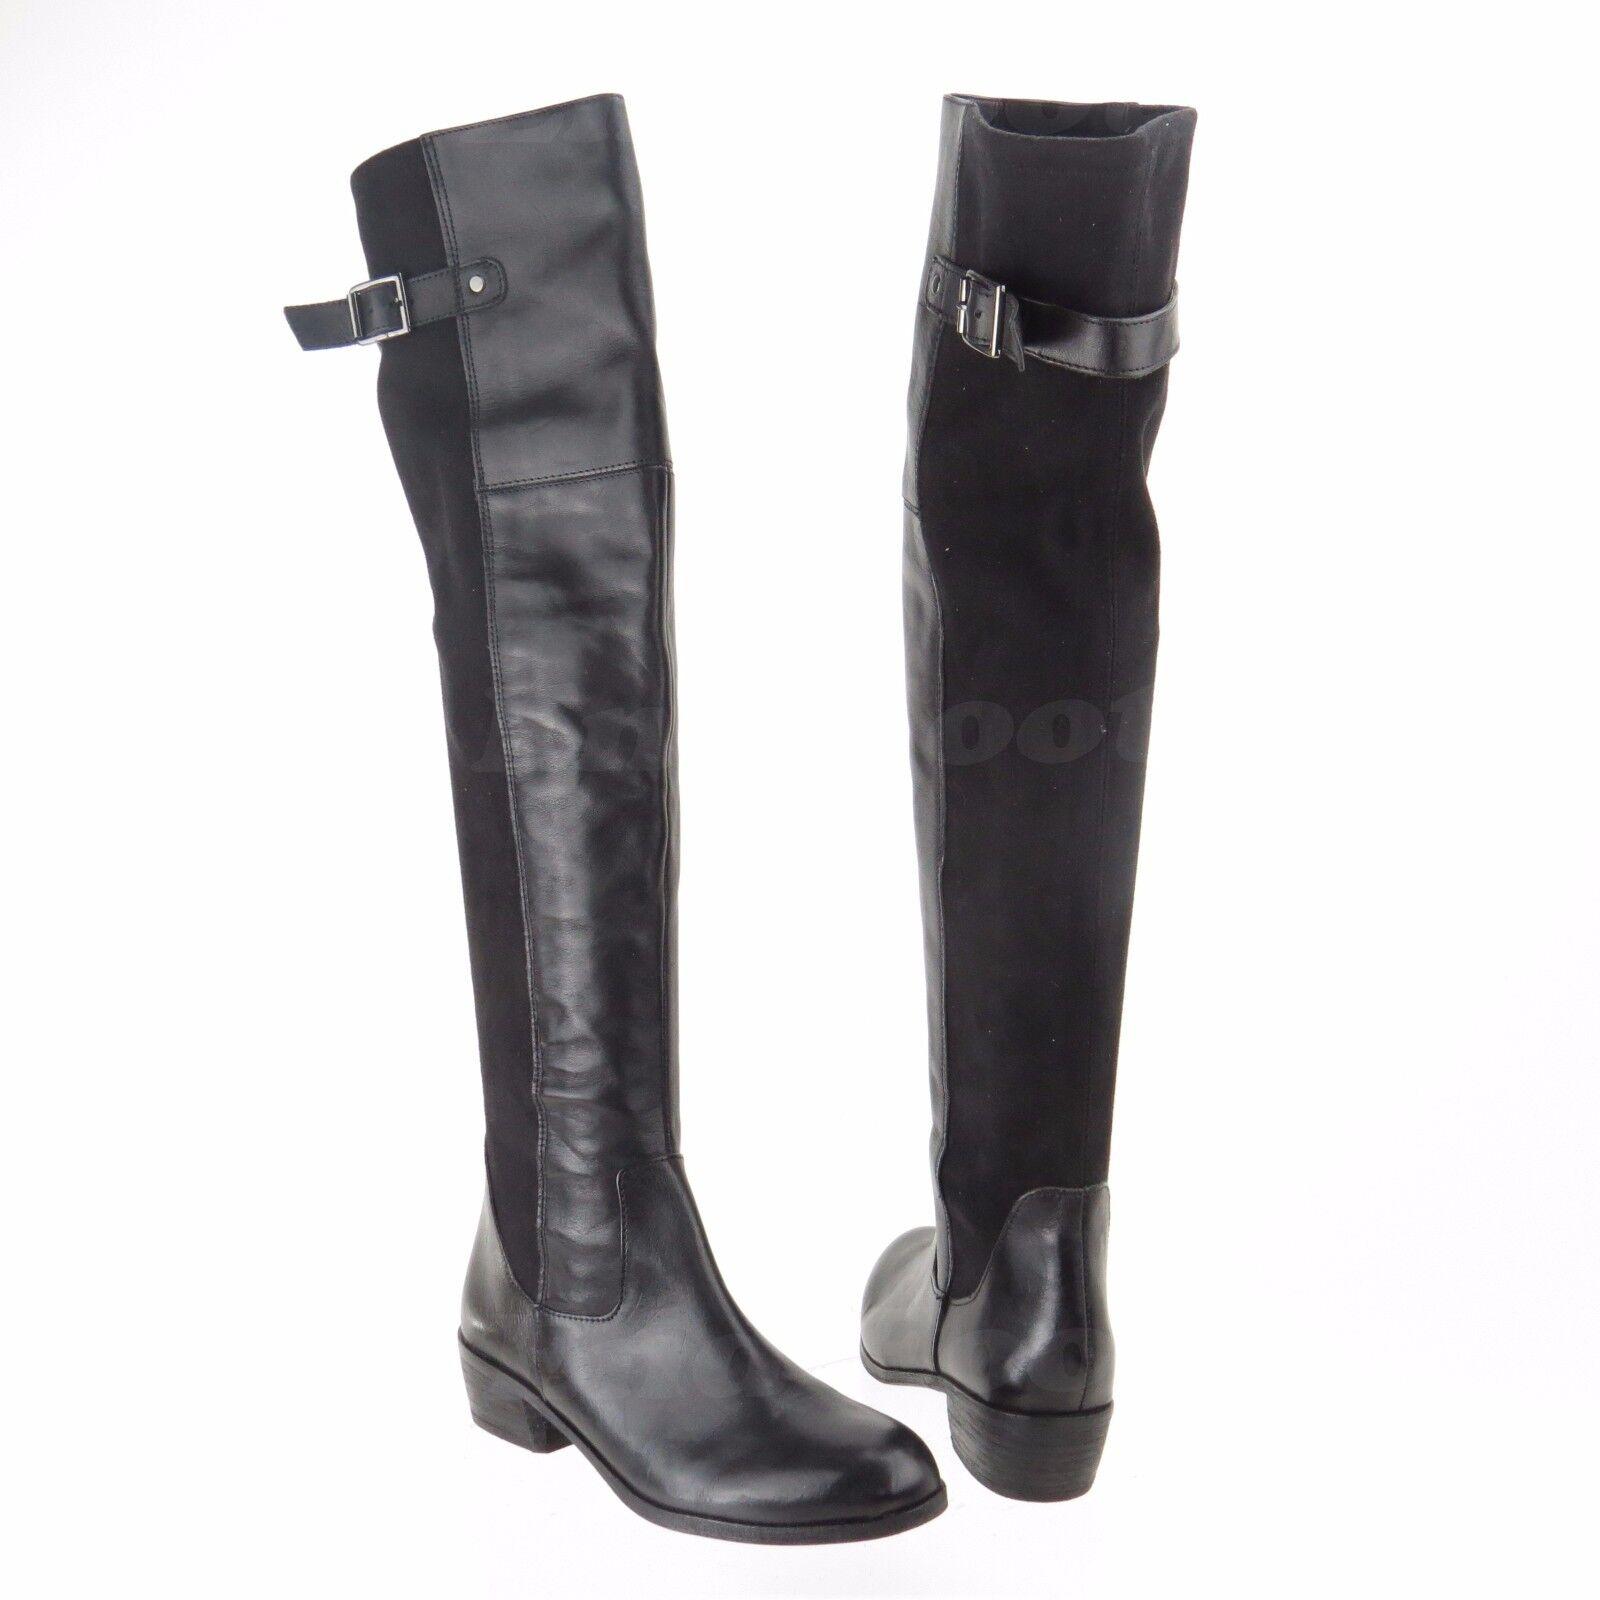 prezzo ragionevole Sam Edelman Jacob Jacob Jacob Donna  scarpe nero Leather Stretch Tall stivali Sz 6 M NEW  275  edizione limitata a caldo